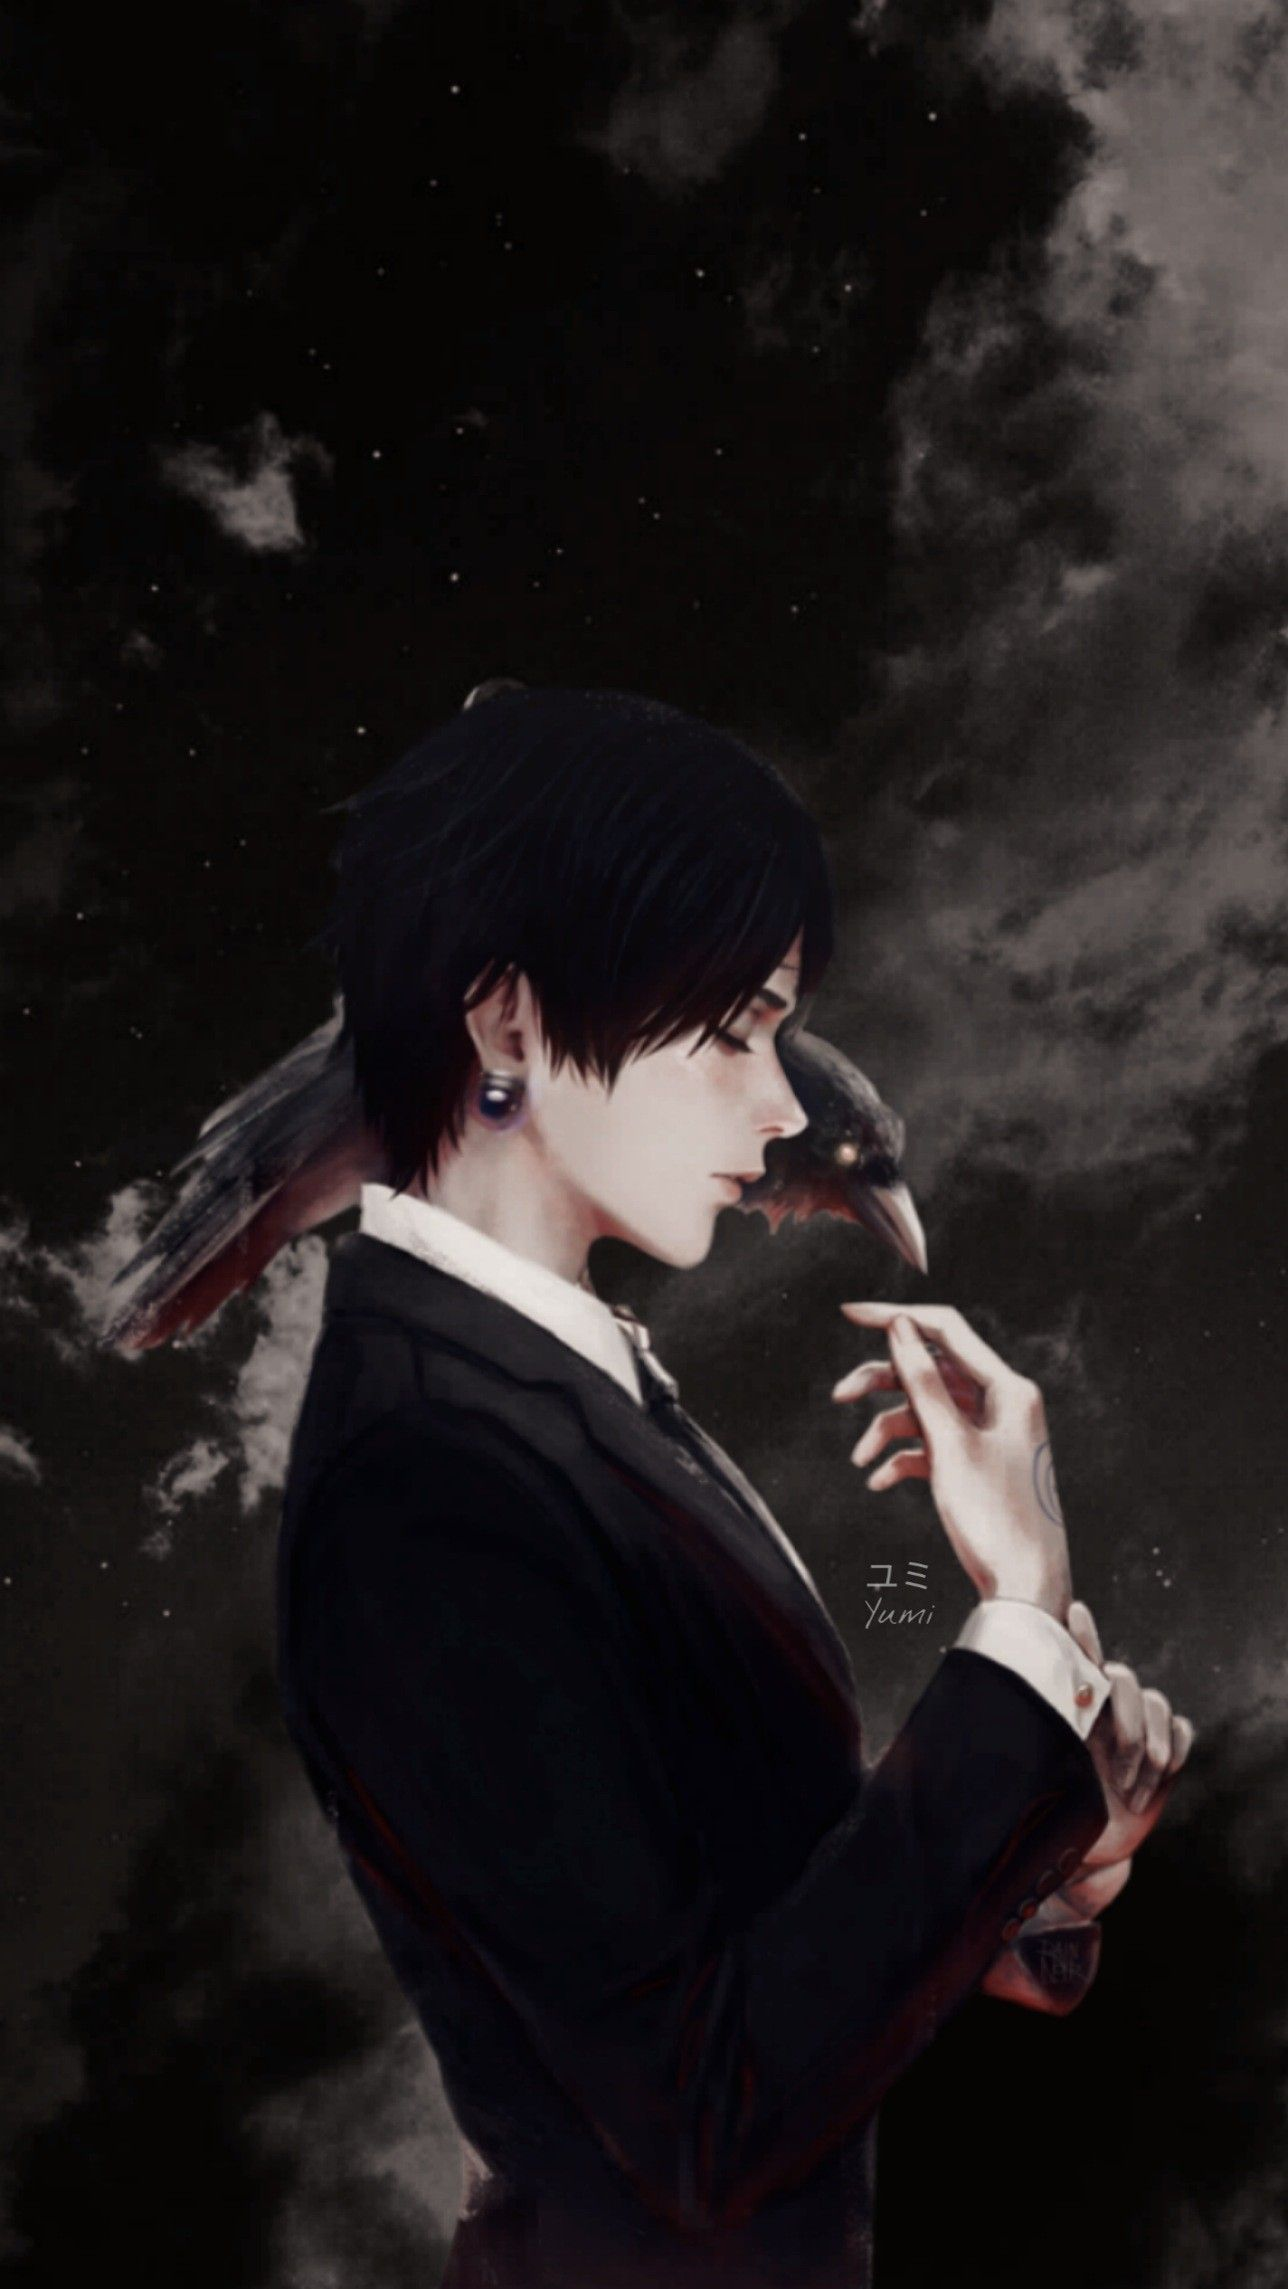 Kuroro Aesthetic Wallpaper Hunter X Hunter In 2020 Hunter X Hunter Dark Anime Aesthetic Wallpapers